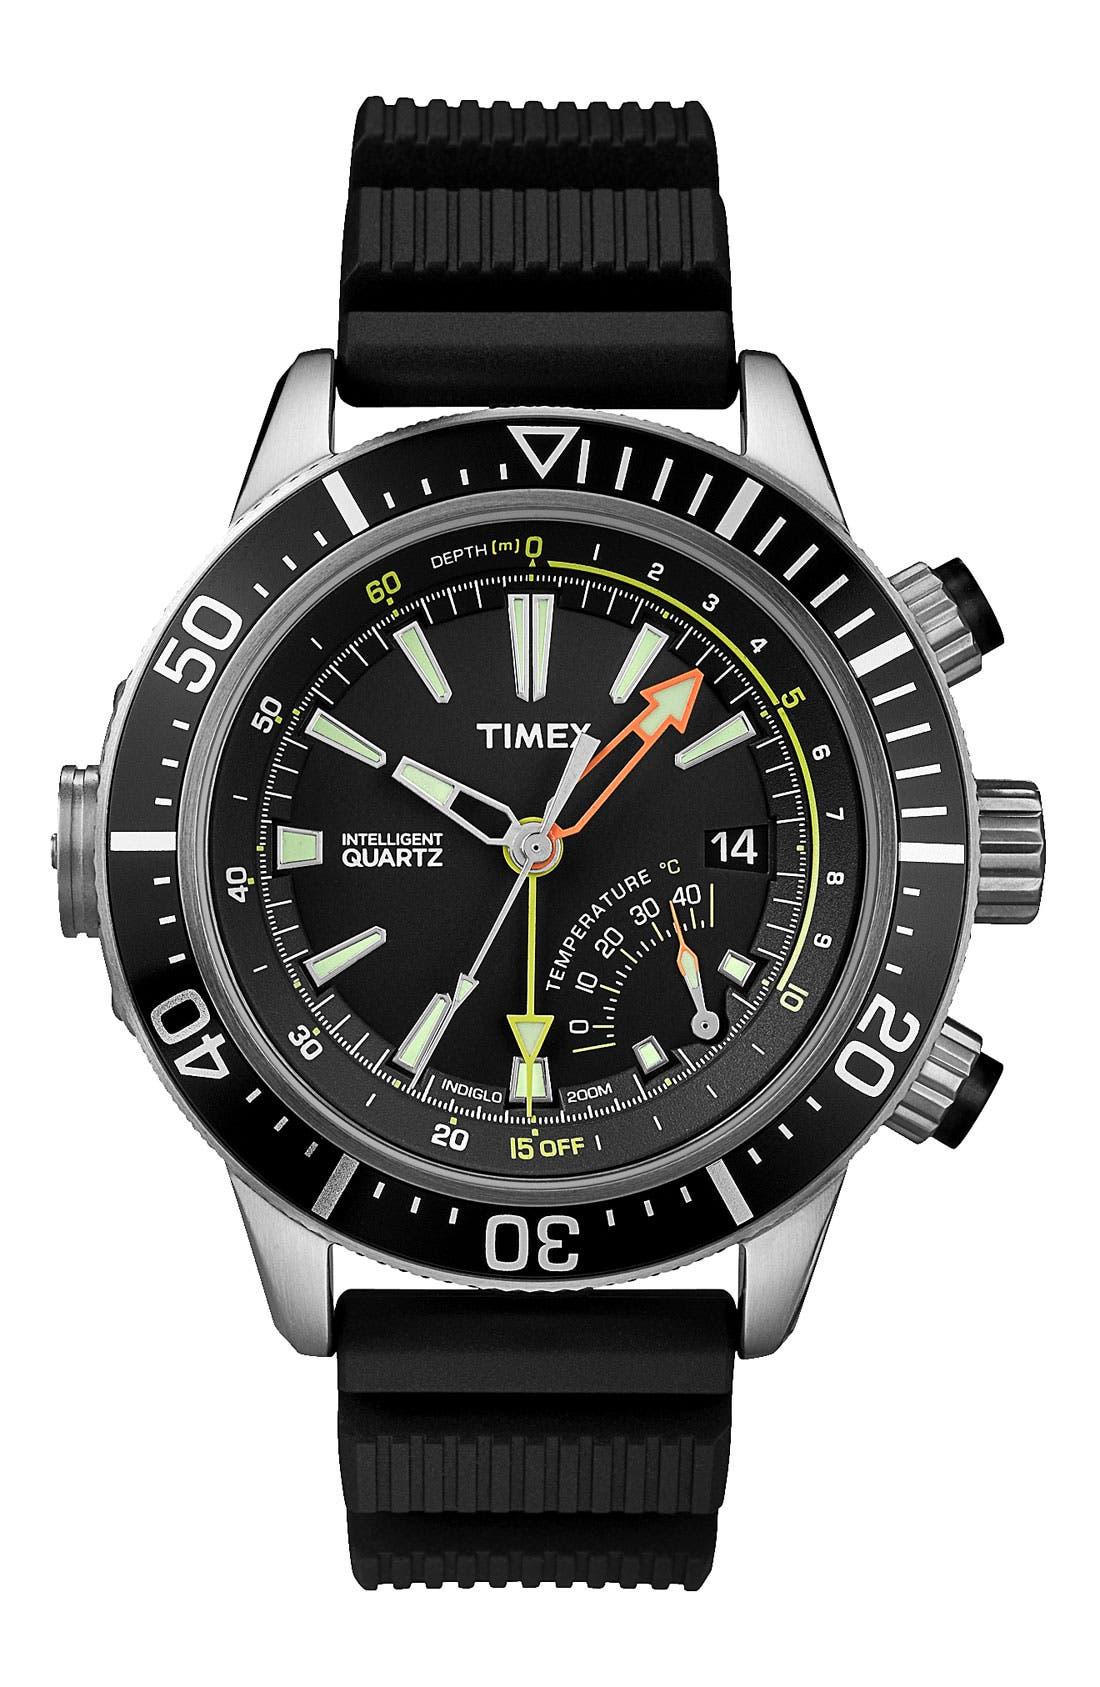 Main Image - Timex® 'Intelligent Quartz' Depth Gauge Resin Strap Watch